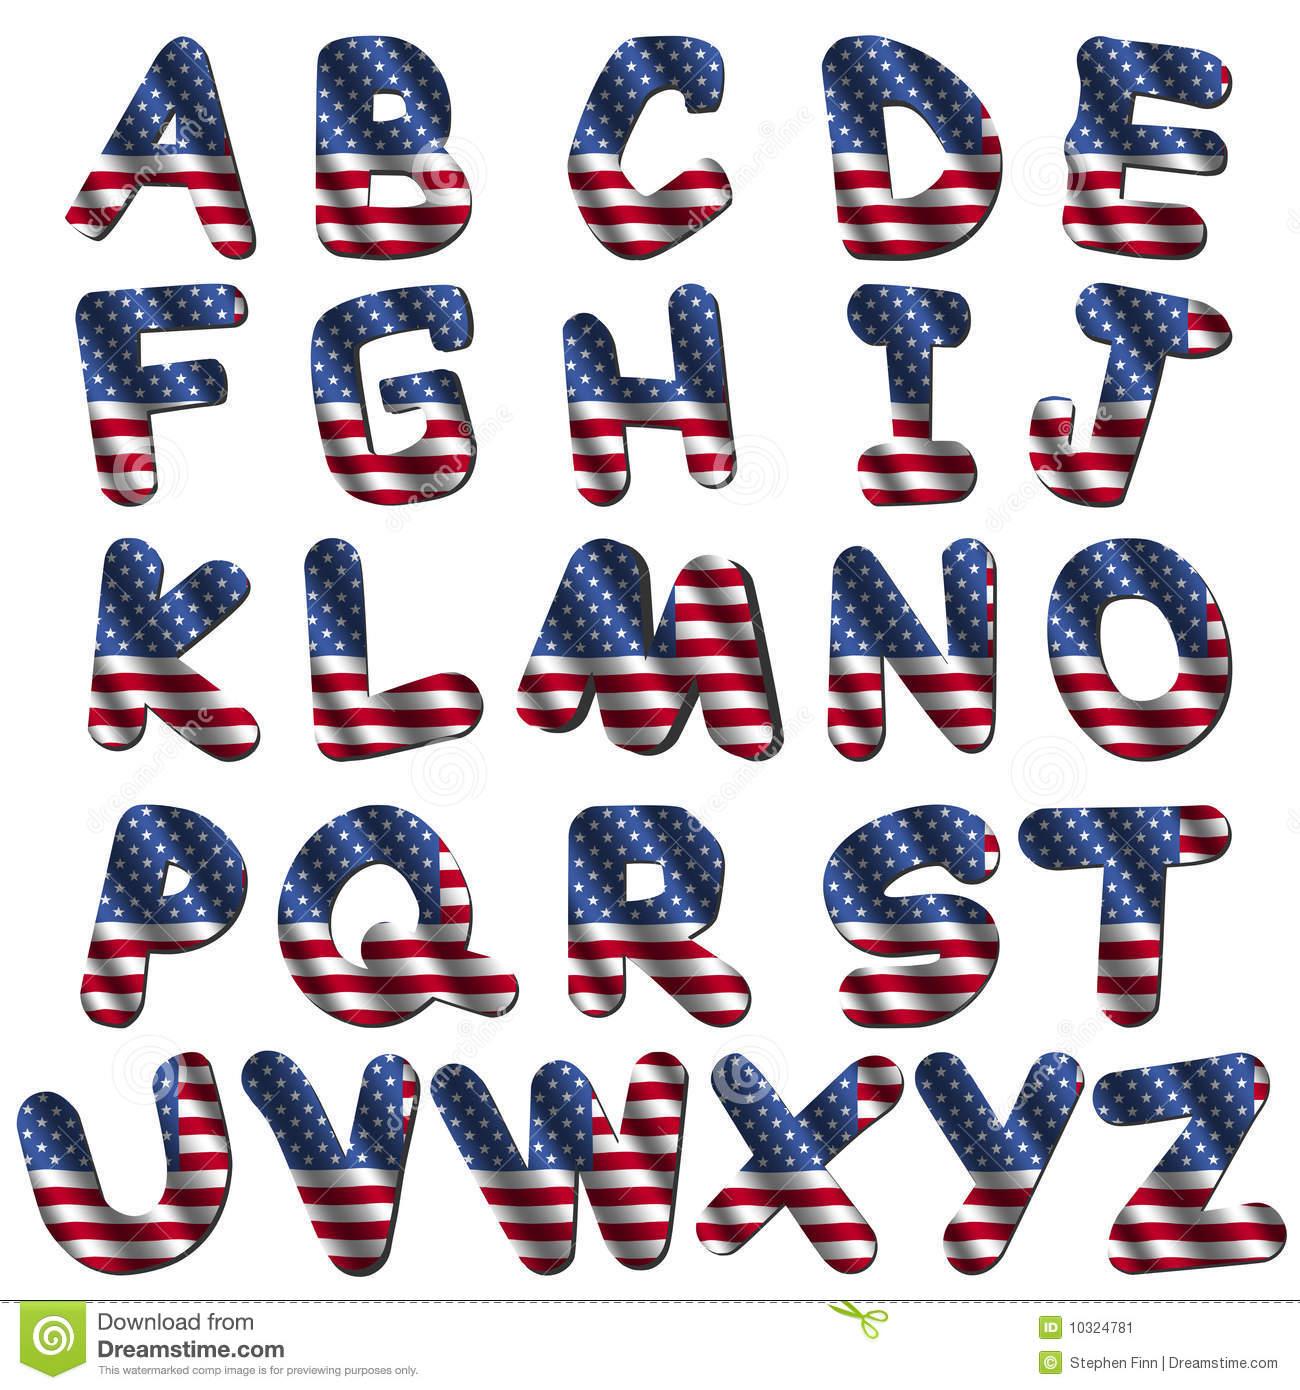 17 Free Flag Font Images - American Flag Font, American